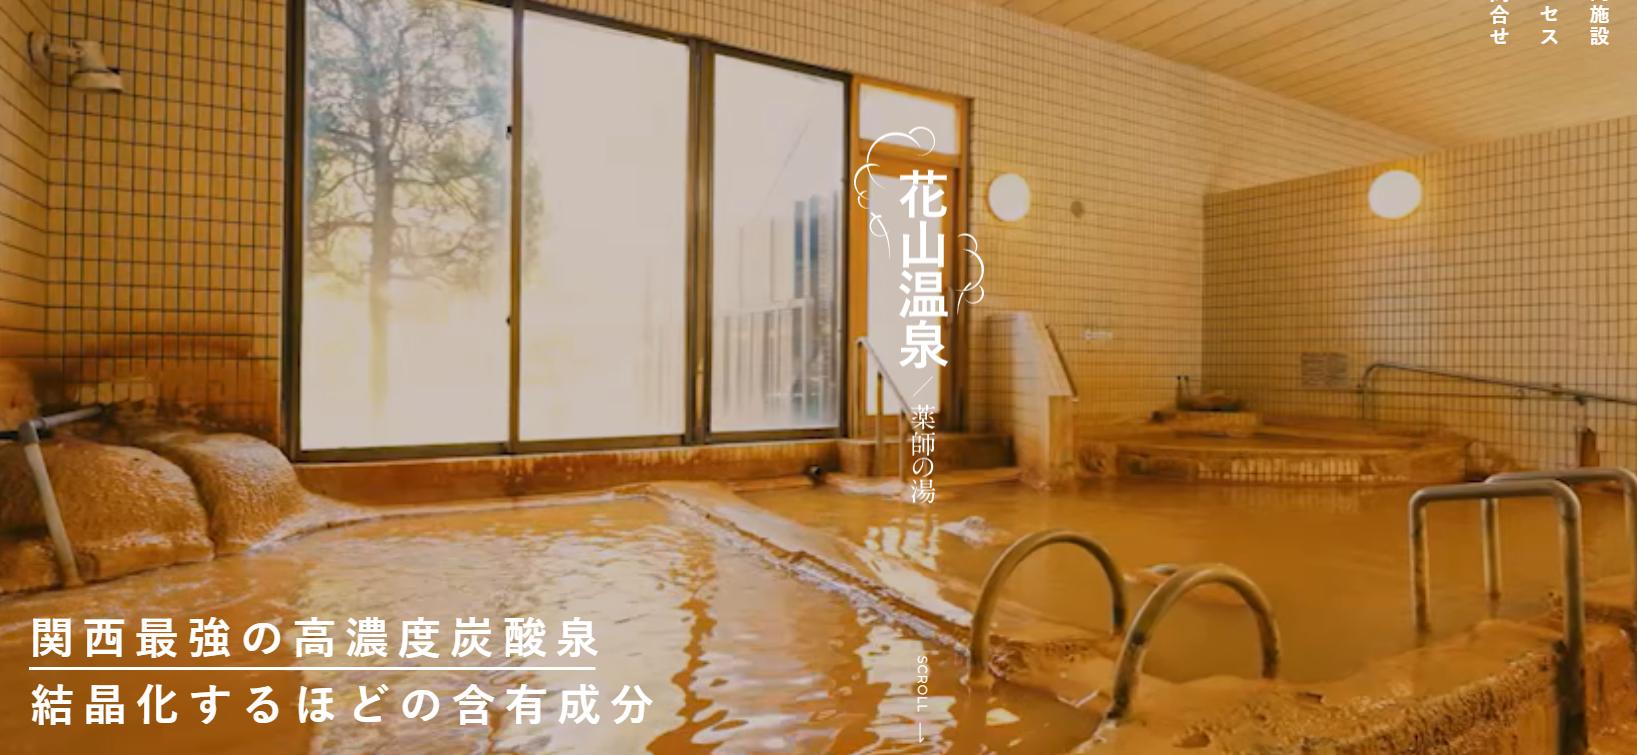 花山温泉 薬師の湯